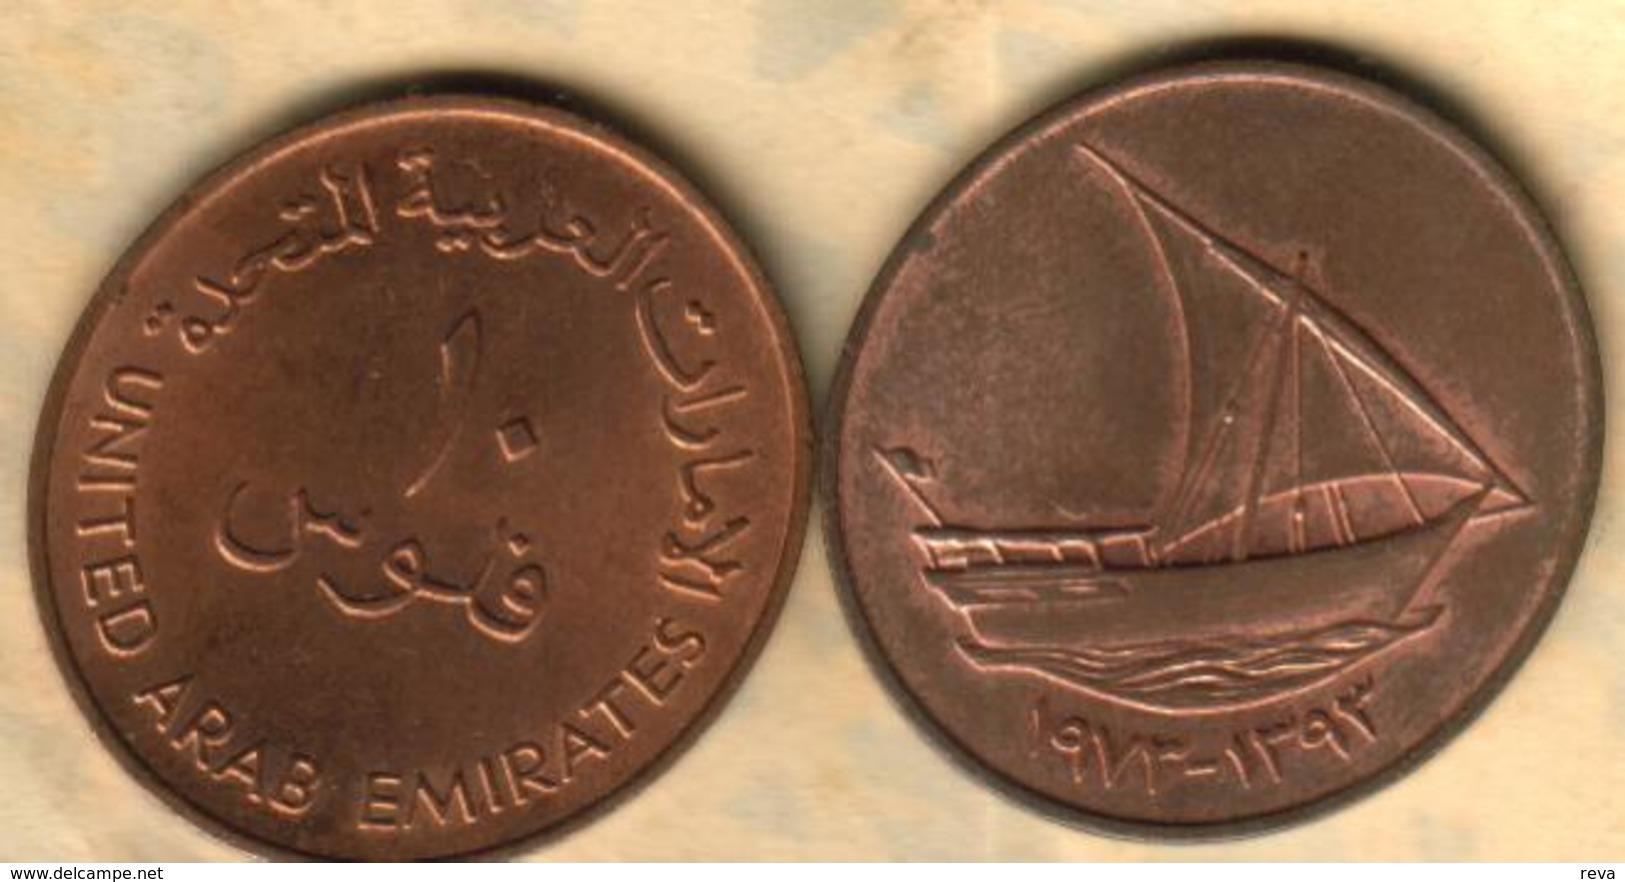 UNITED ARAB EMIRATES 10 FILS INSCRIPTIONS  FRONT SHIP BACK  1973-1393 VF READ DESCRIPTION CAREFULLY !!! - Emirats Arabes Unis